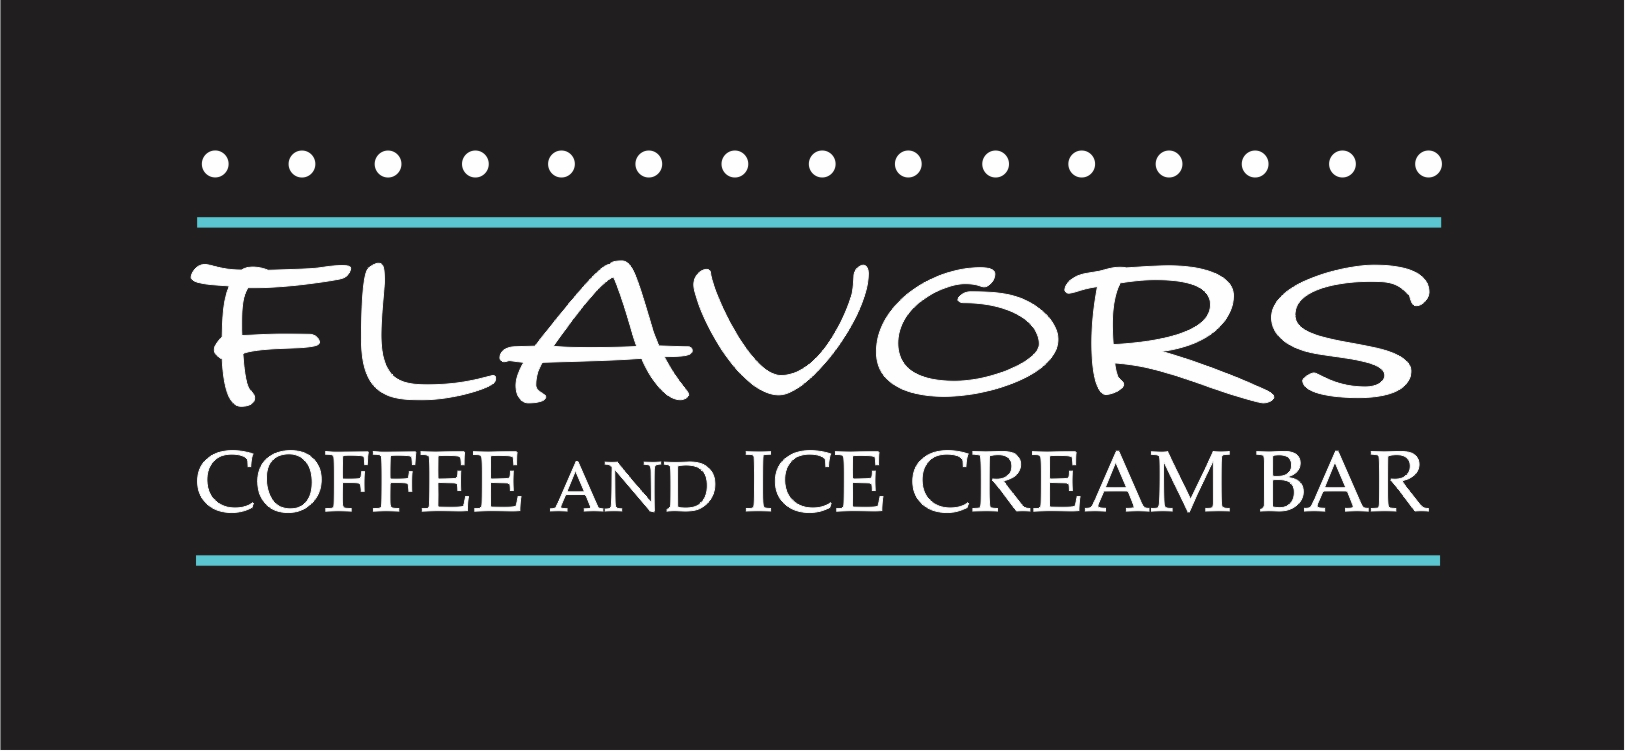 Flavors Coffee & Ice Cream Bar